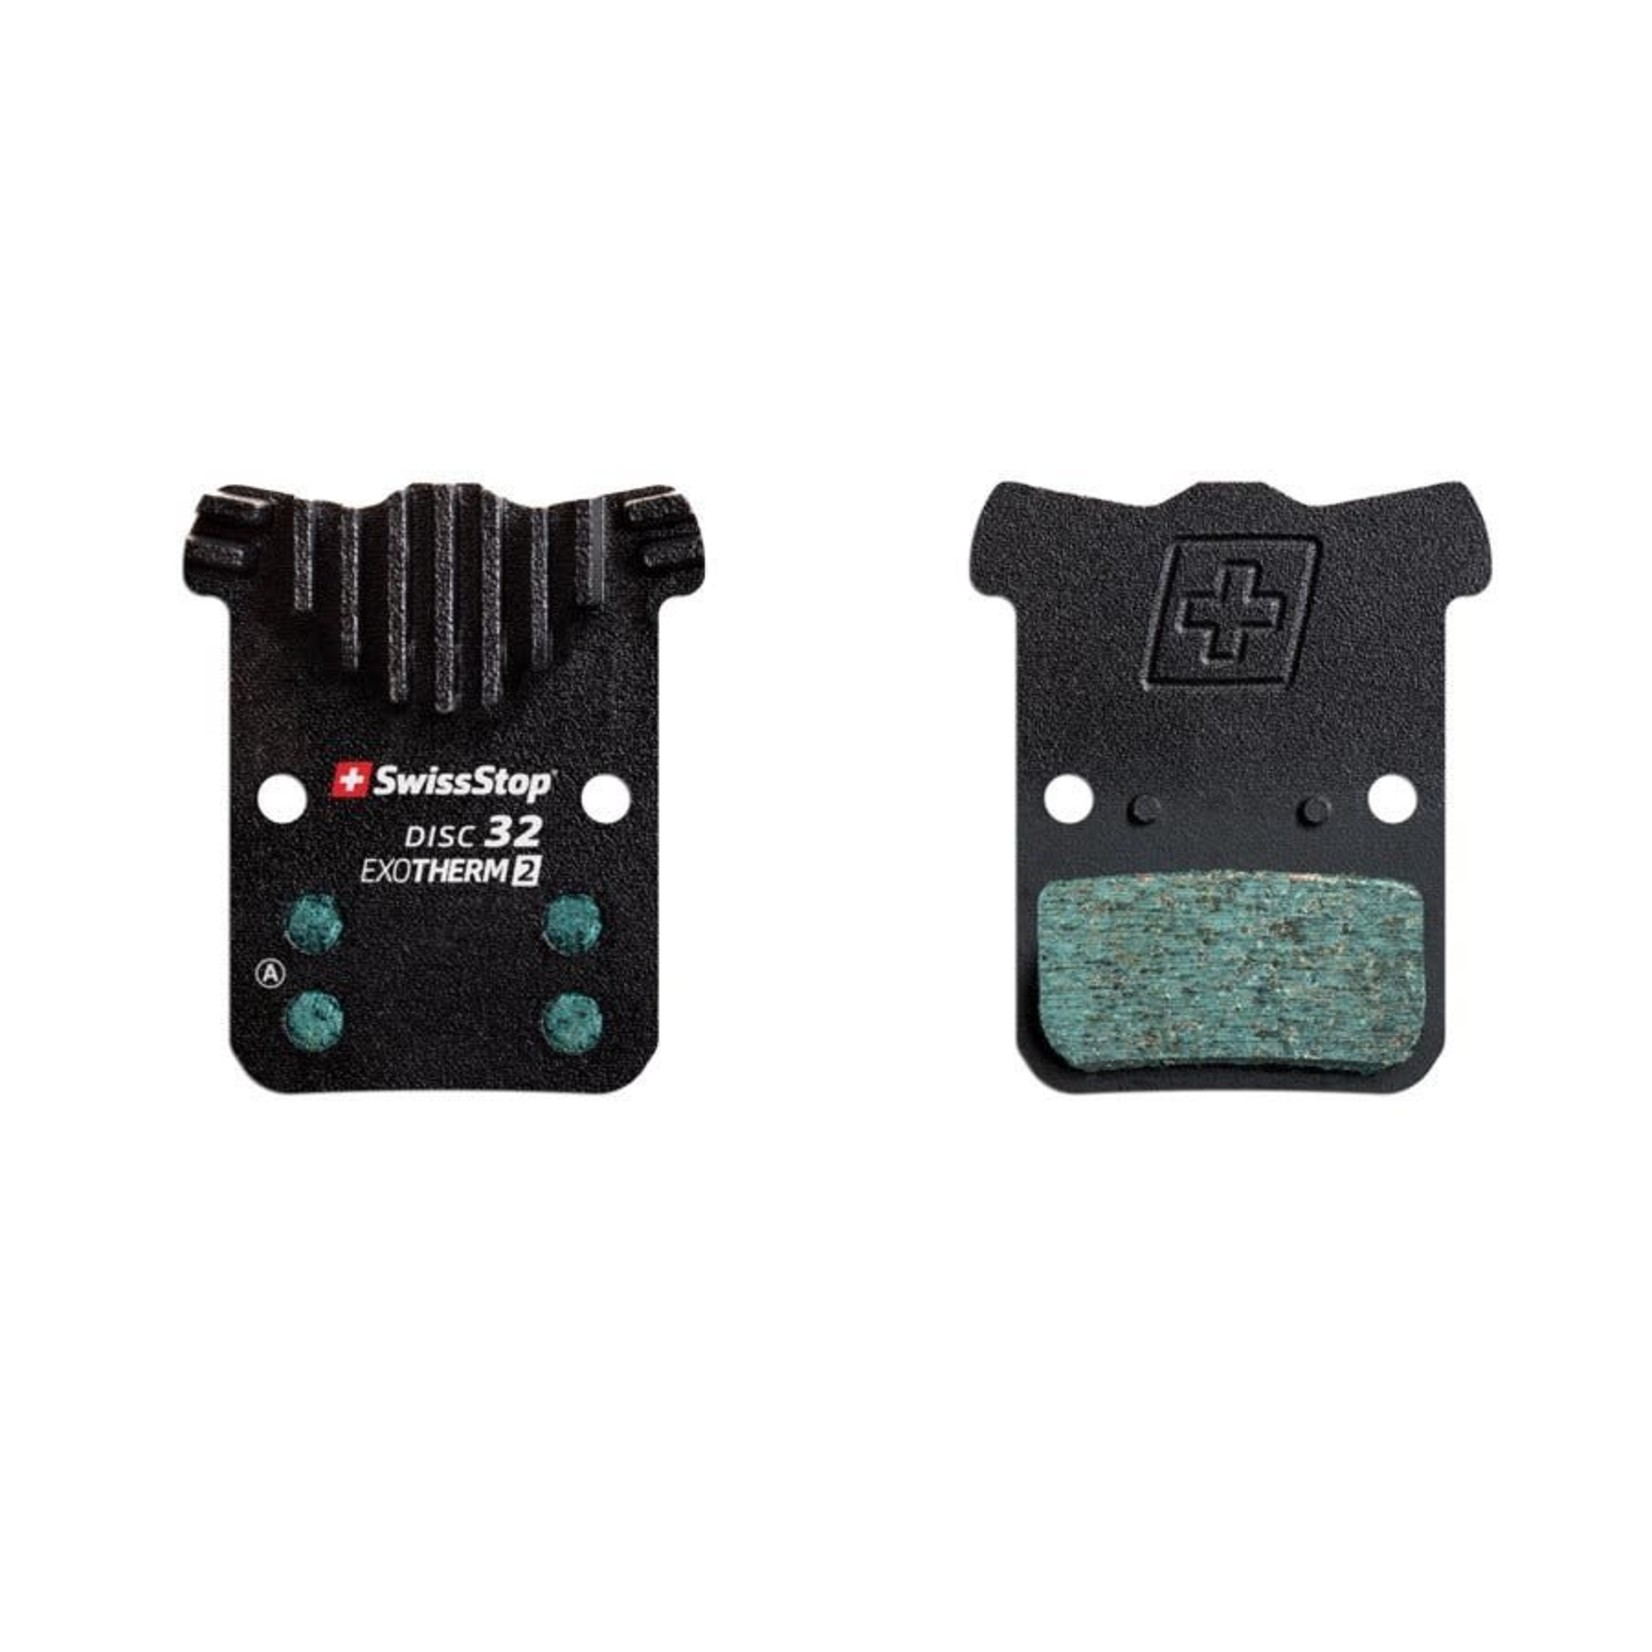 SwissStop SwissStop, EXOTherm 2, Disc Brake Pads, Shape: SRAM HRD/Level TLM, Organic, Pair